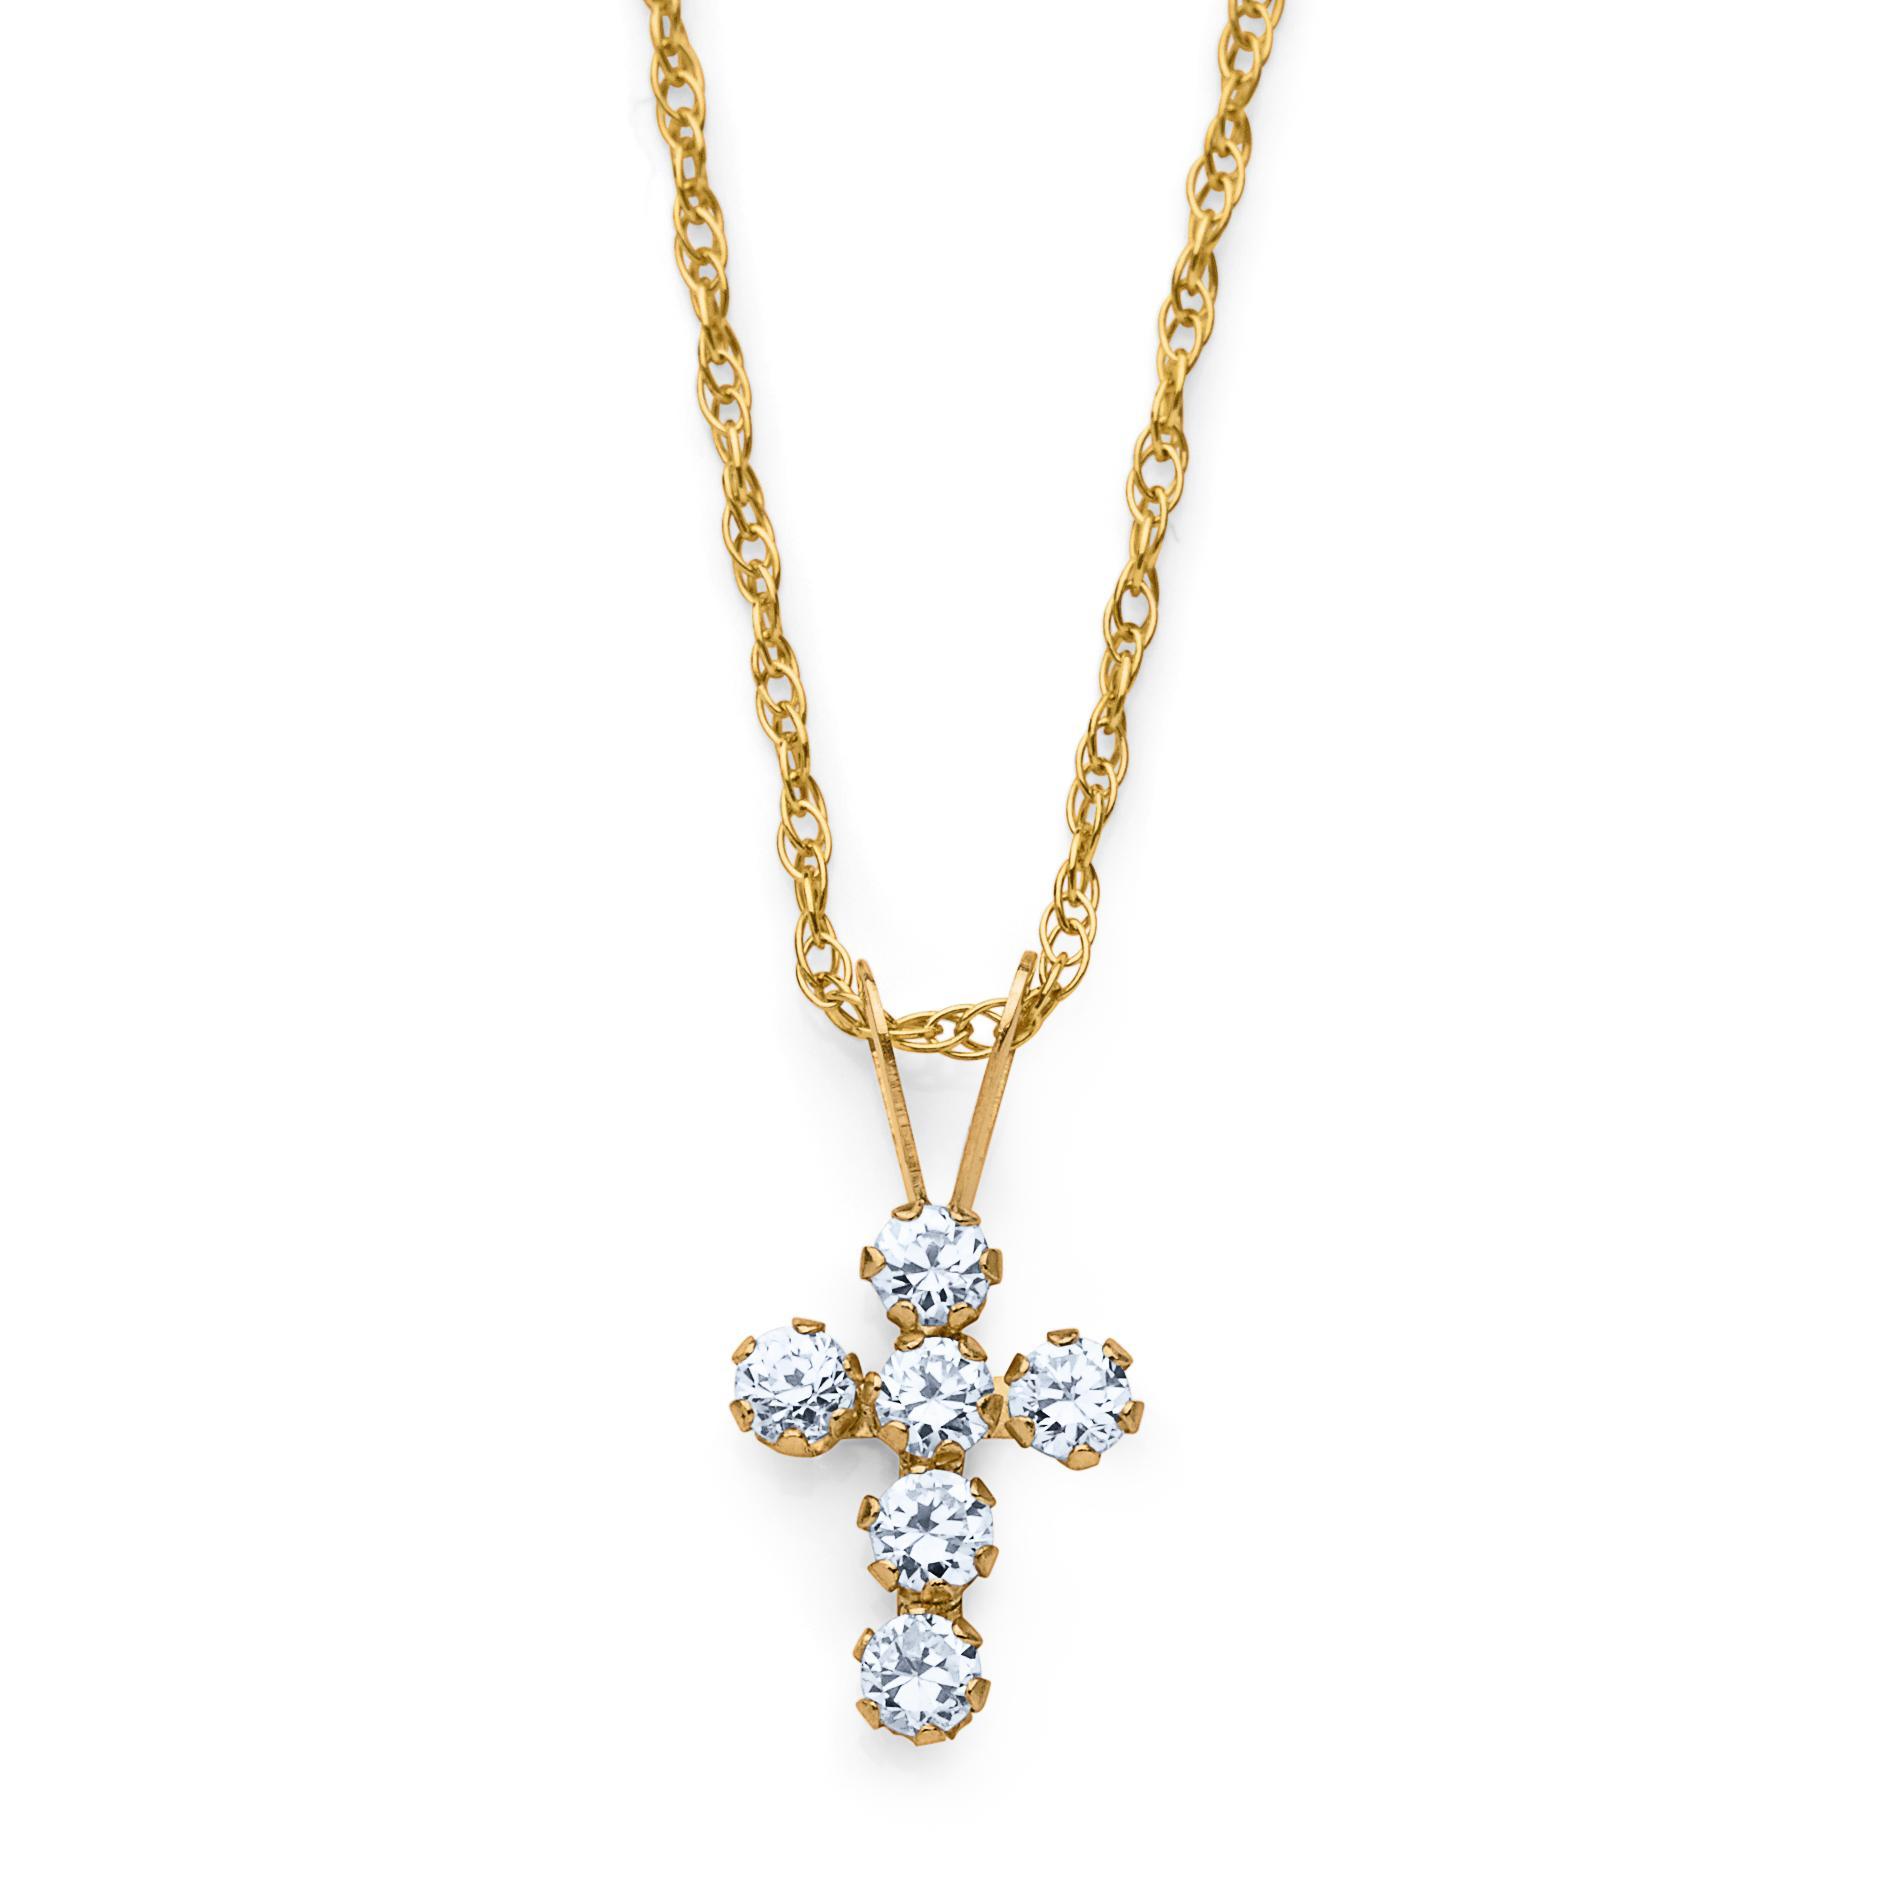 Girl's 10K Gold Cubic Zirconia Cross Pendant Necklace